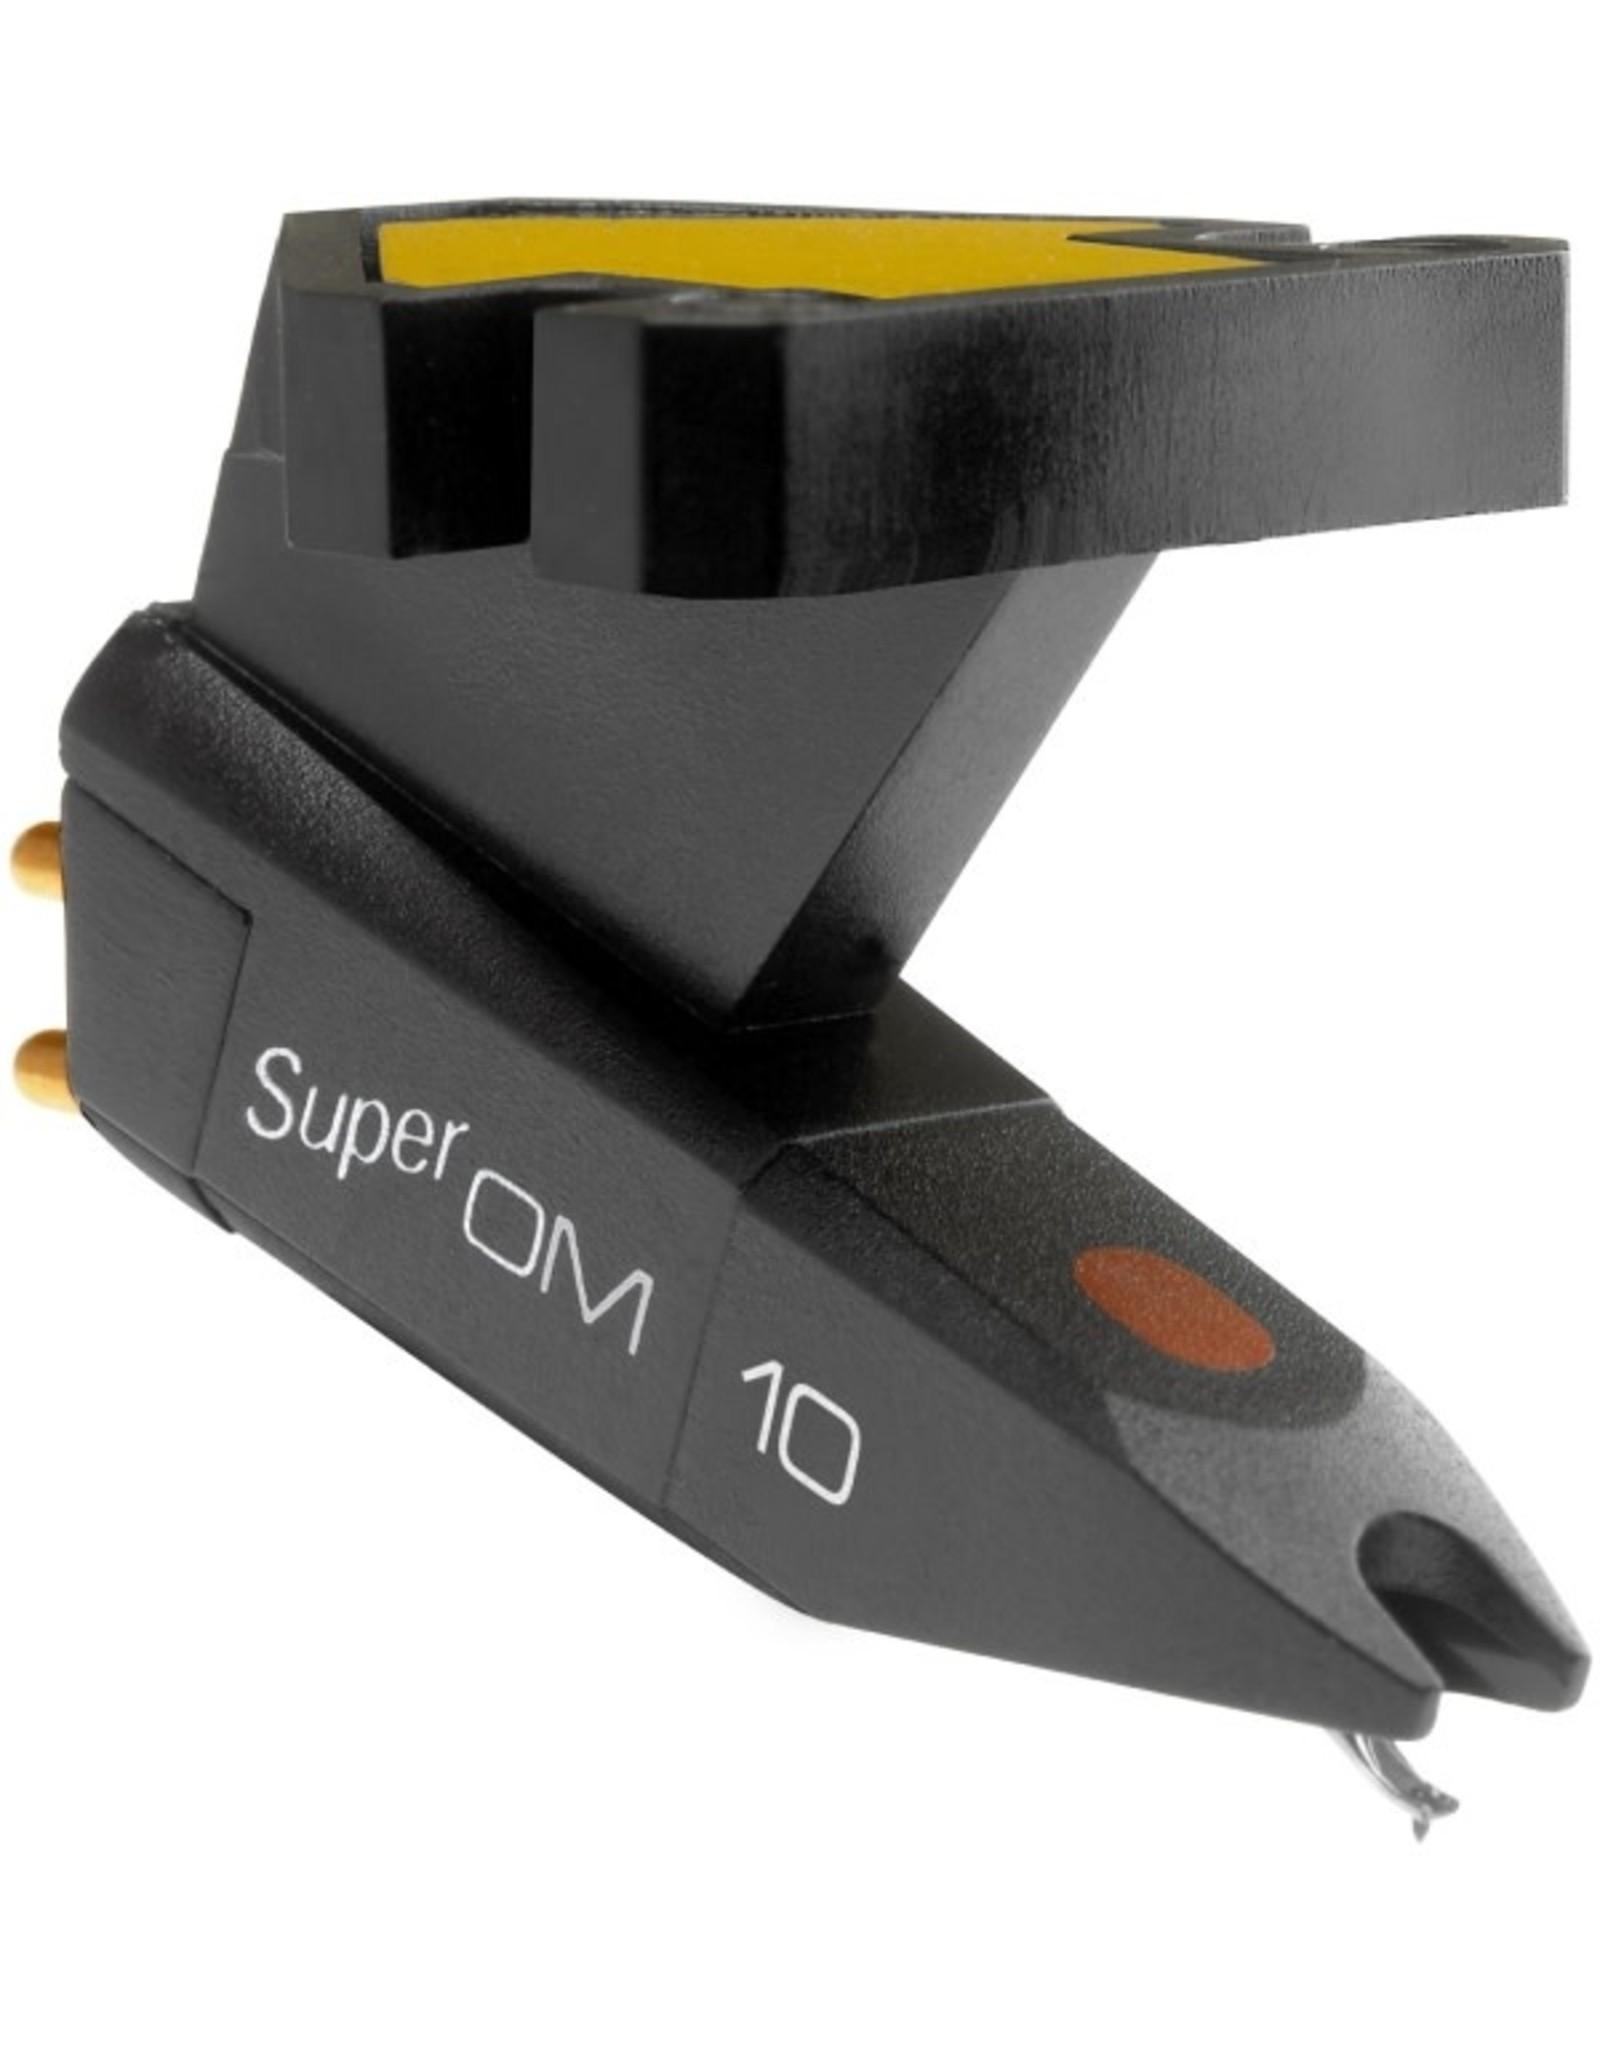 Ortofon Ortofon Super OM 10 Phono Cartridge